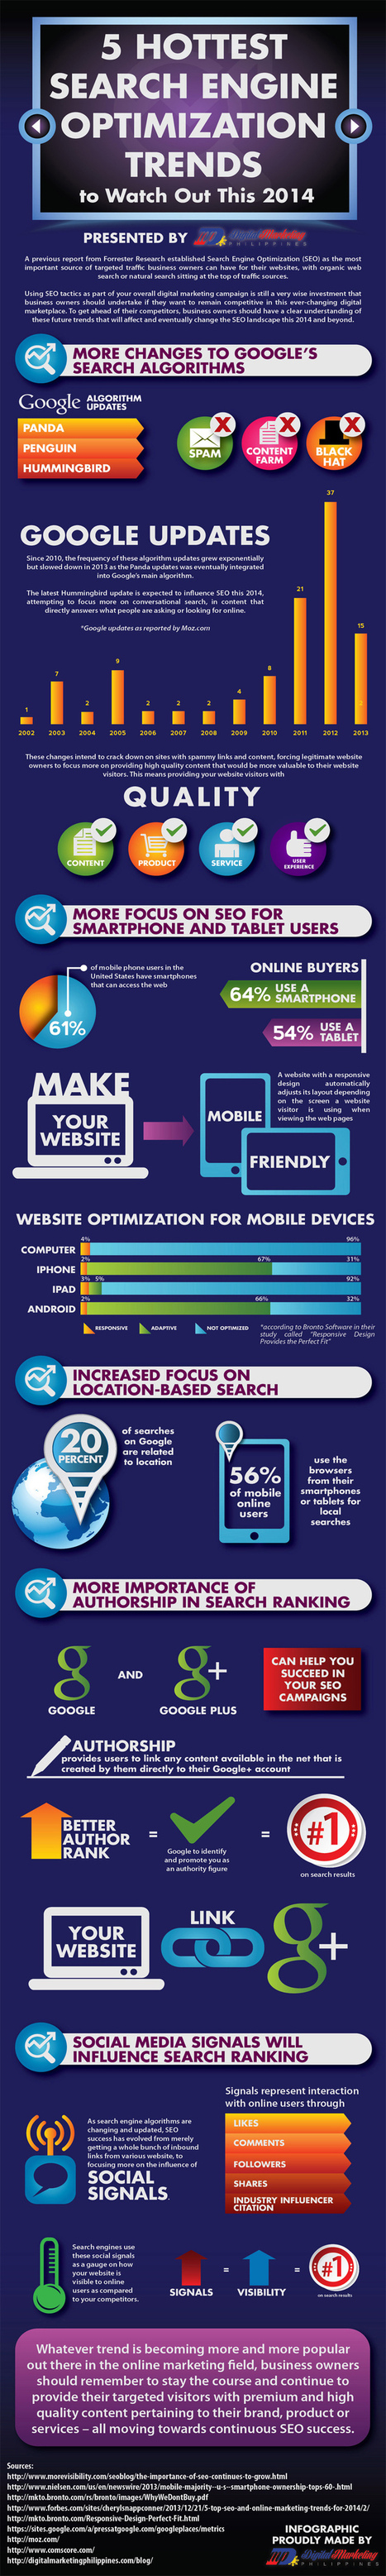 5 Search Engine Optimization Trends For 2014 (Infographic) | Social Media e Innovación Tecnológica | Scoop.it